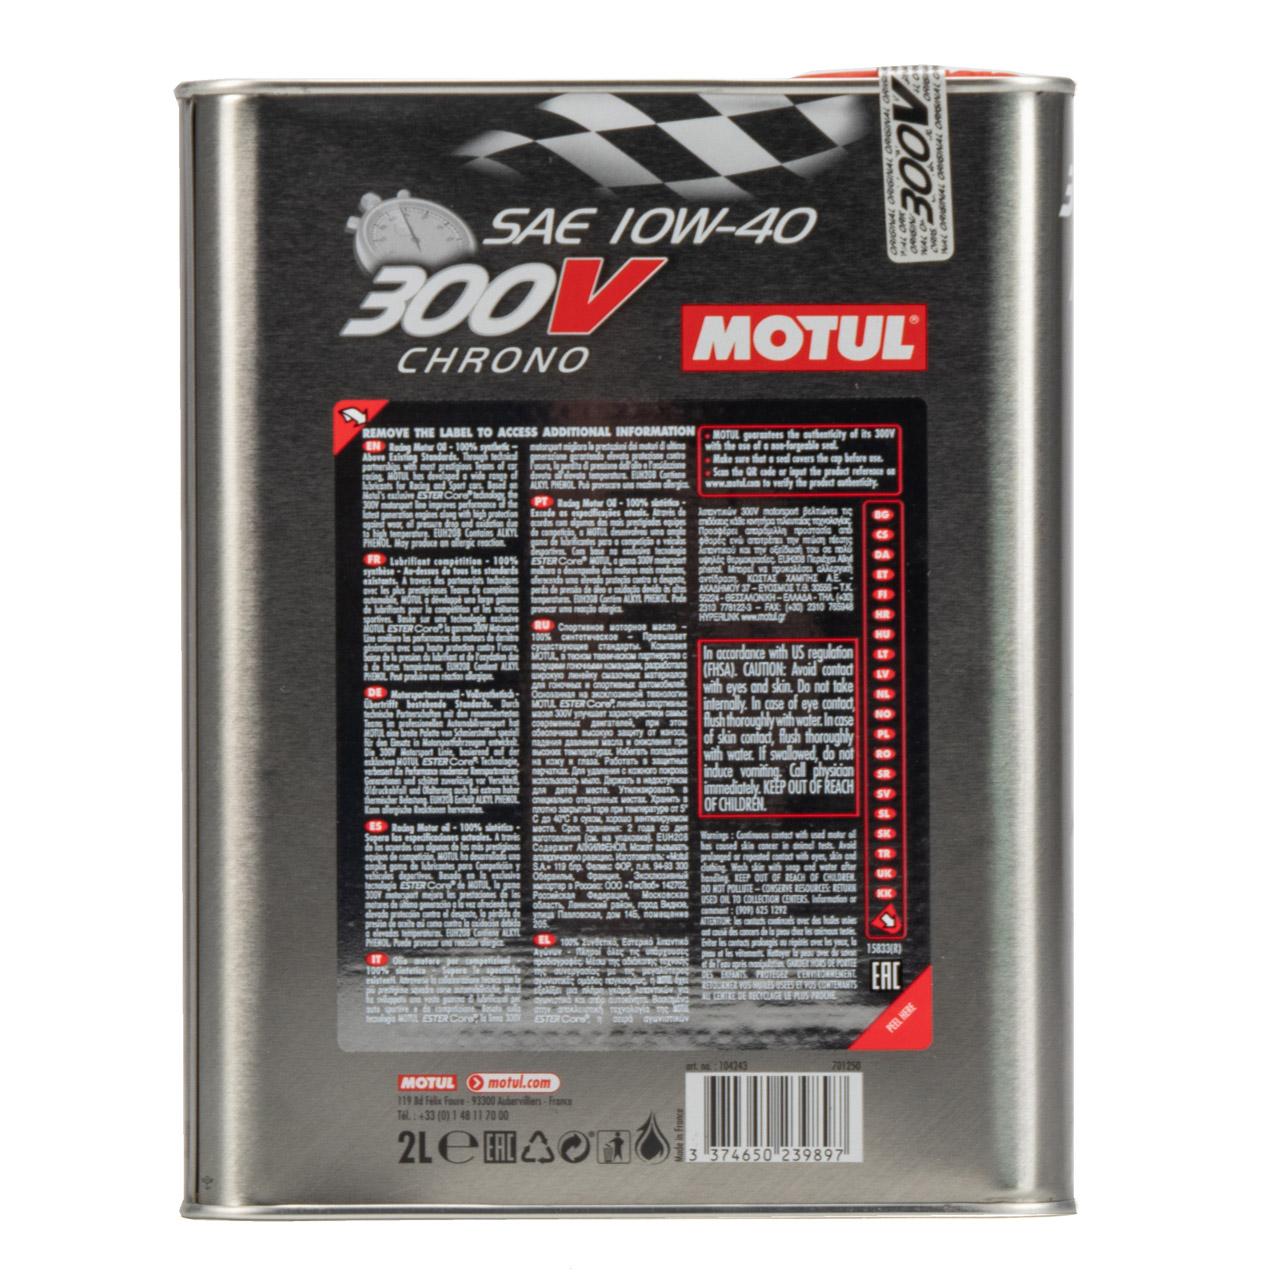 MOTUL 300V CHRONO Motoröl Öl 10W40 100% Synthetic Ester Core - 2L 2 Liter